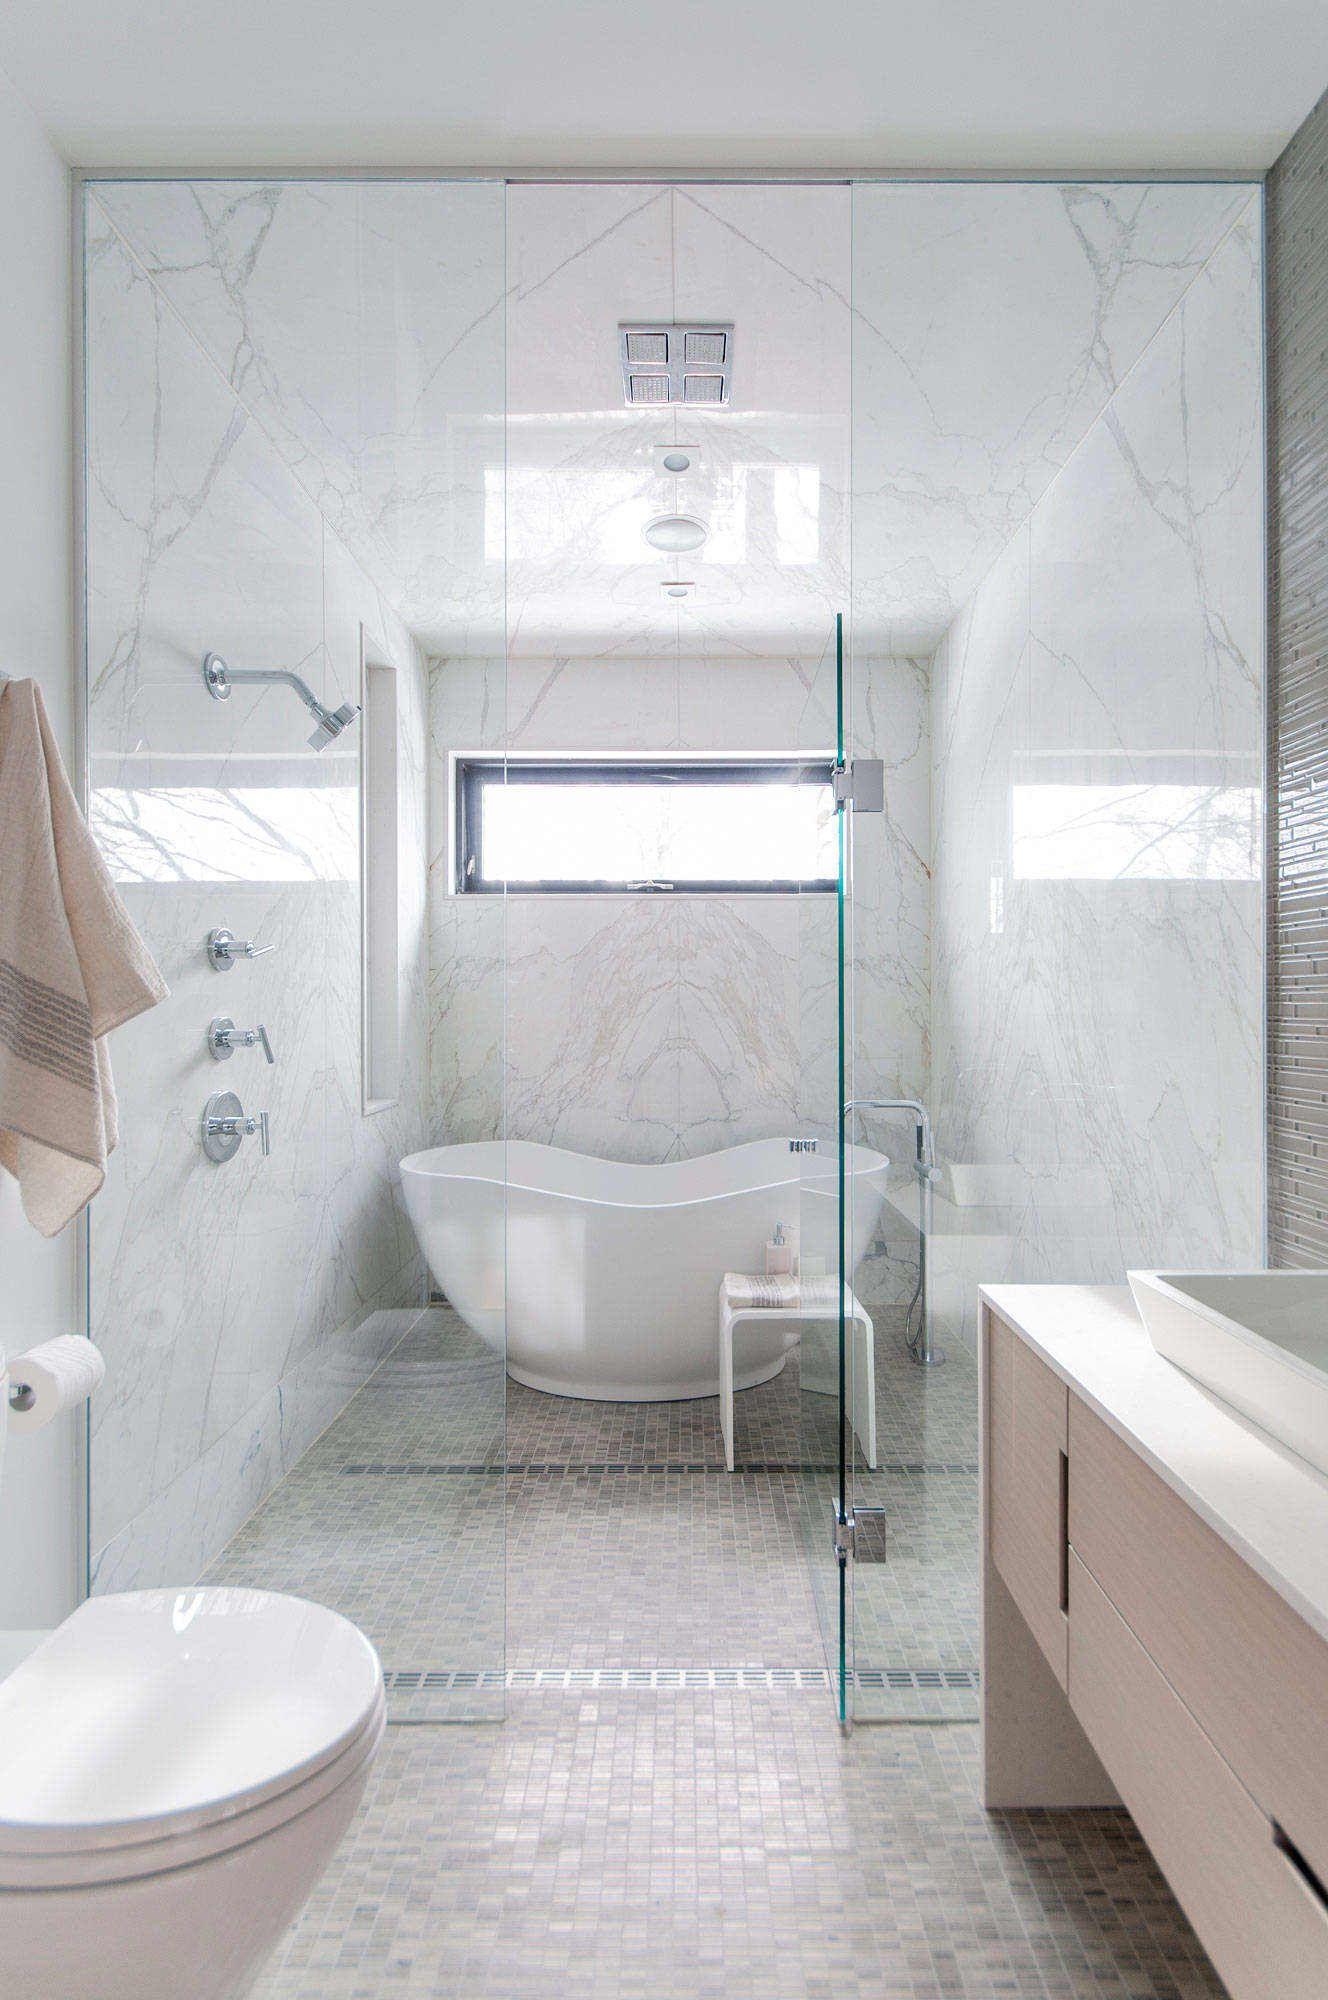 Modern Style Freestanding Bathtubs For Bathroom Remodel Ideas